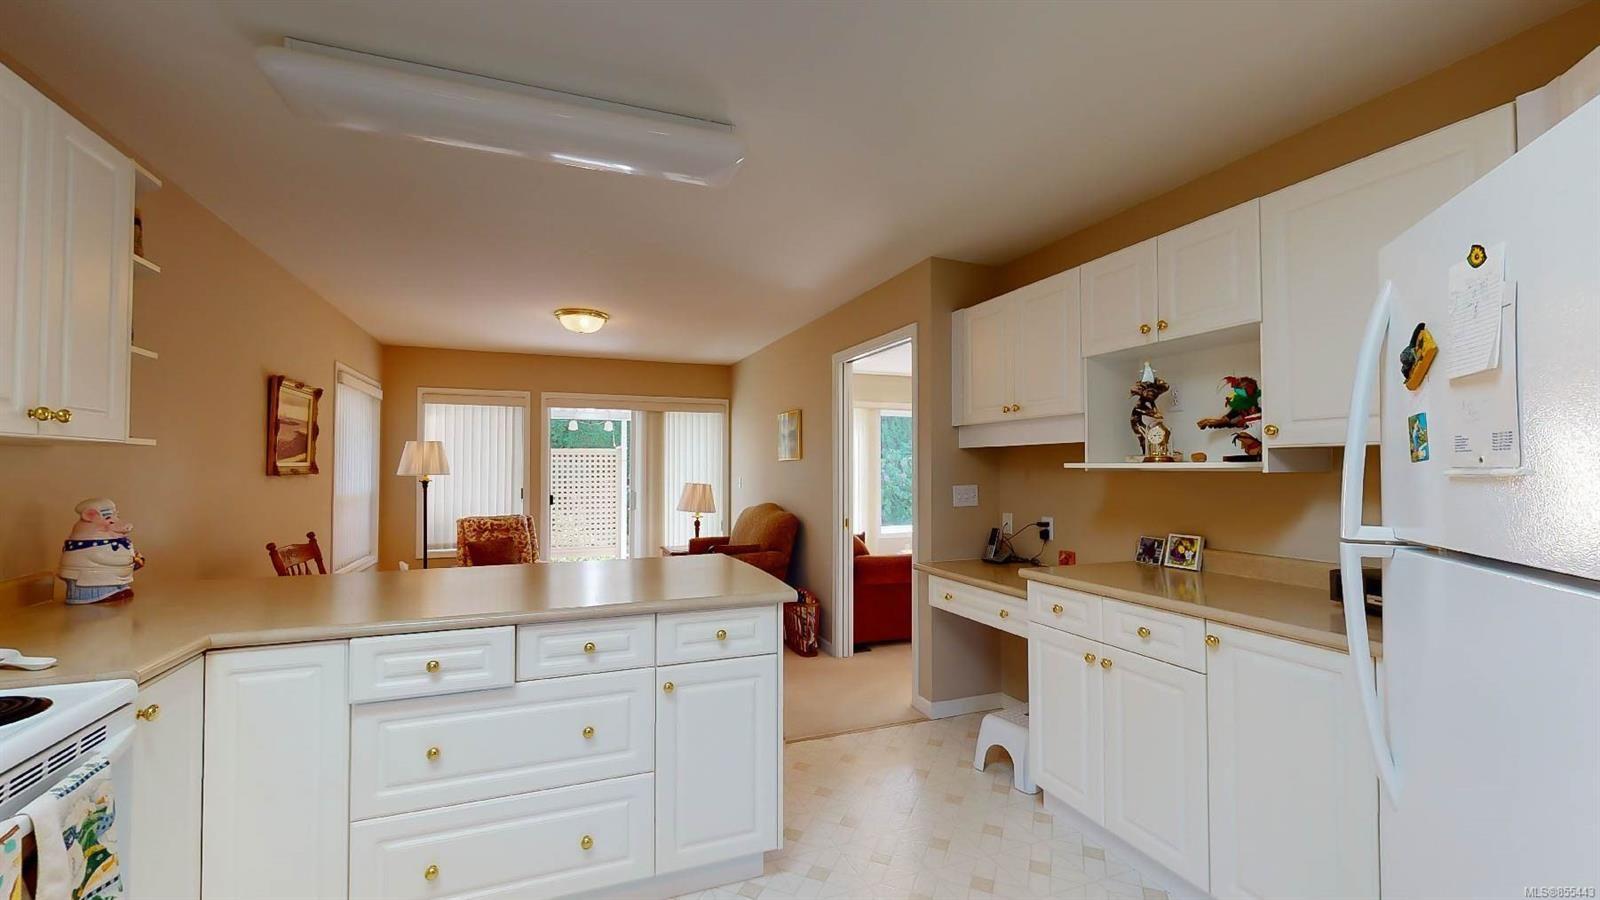 Photo 13: Photos: 1294 Leeward Way in : PQ Qualicum Beach House for sale (Parksville/Qualicum)  : MLS®# 855443